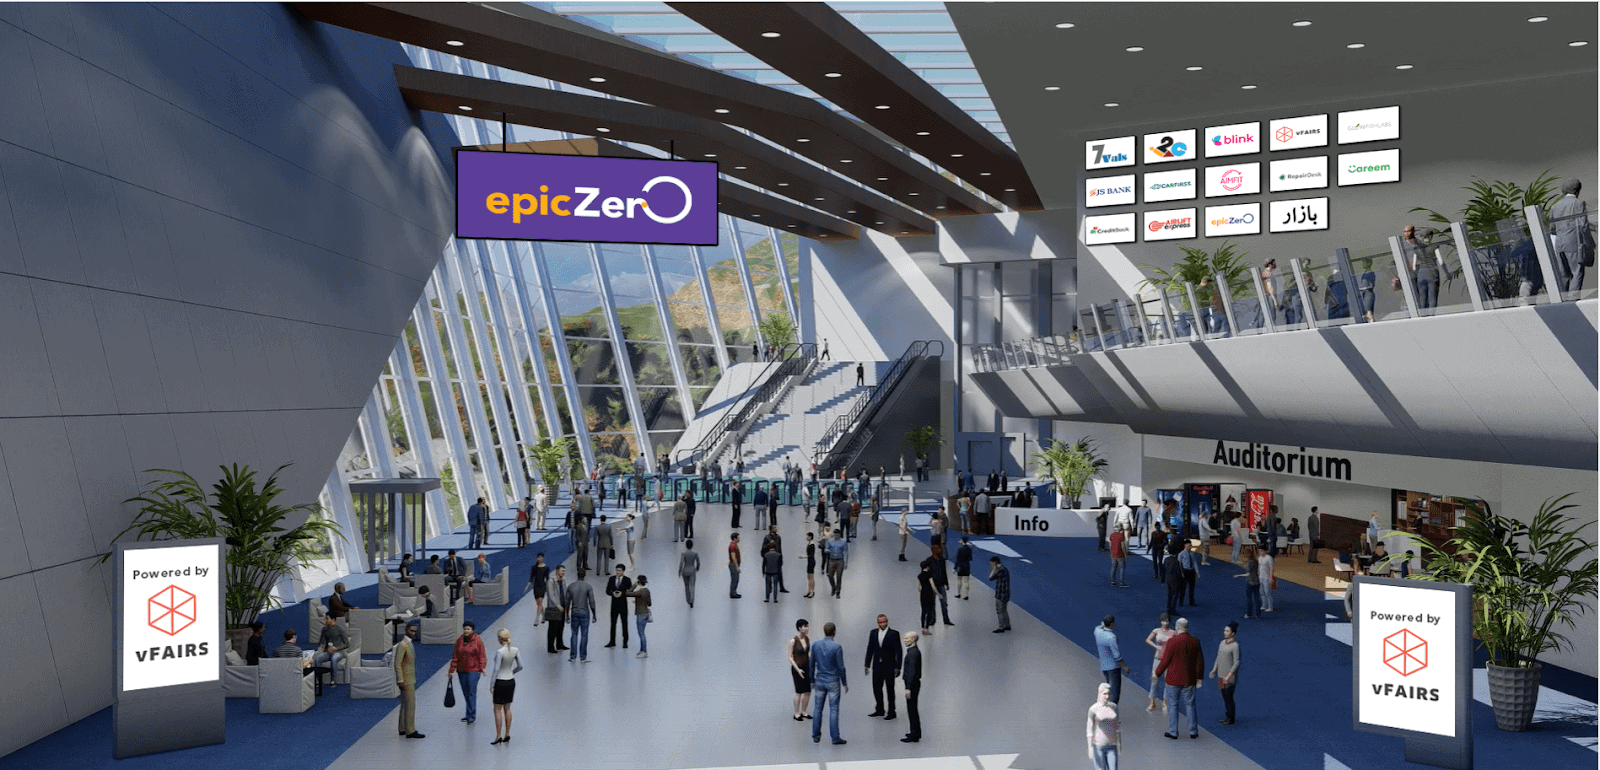 epiczero hybrid event virtual lobby